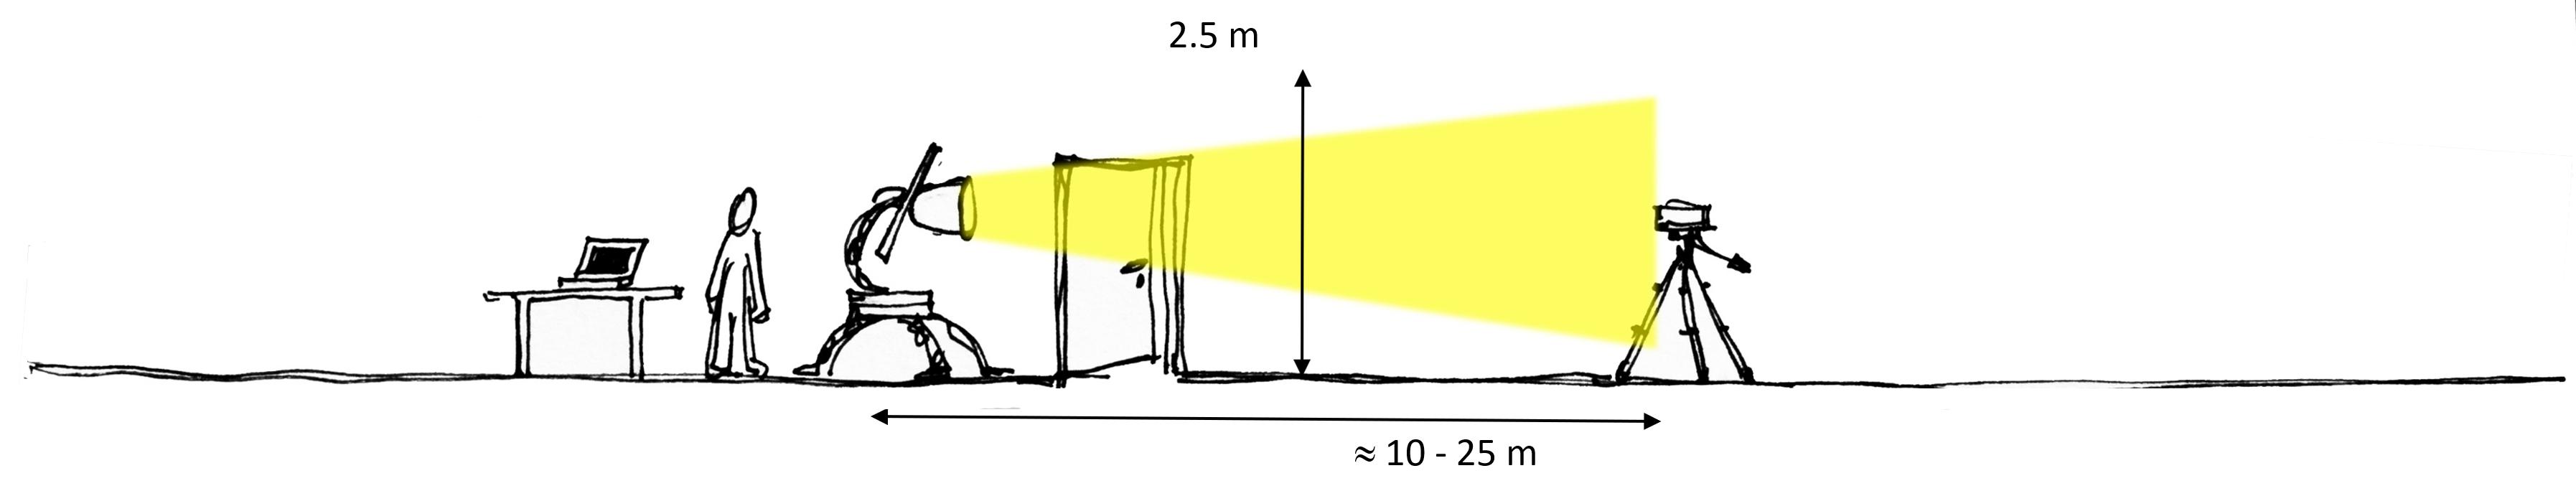 Viso goniometer light measurement lab without integrating sphere